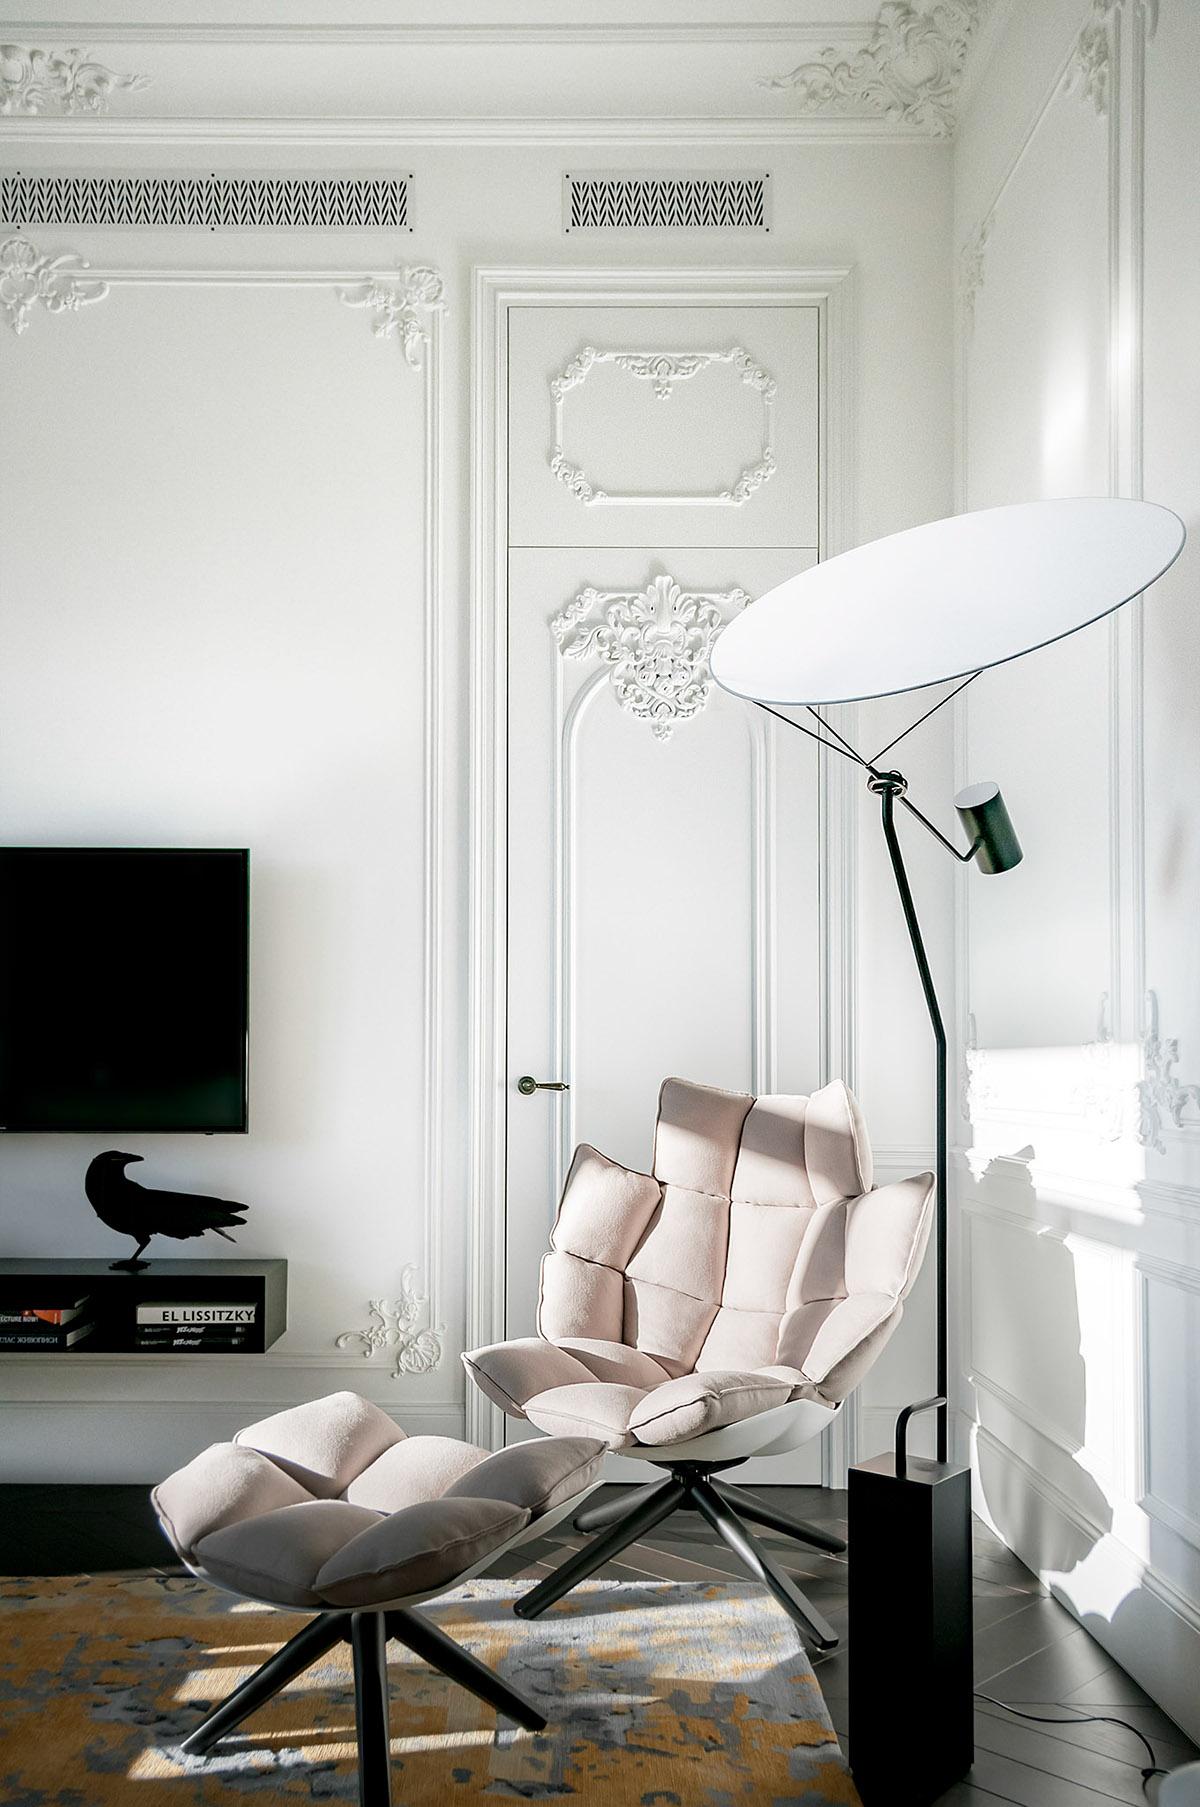 alena-makagon-7 серый цвет в интерьере Алена Макагон – серый цвет в интерьере Alena Makagon 7